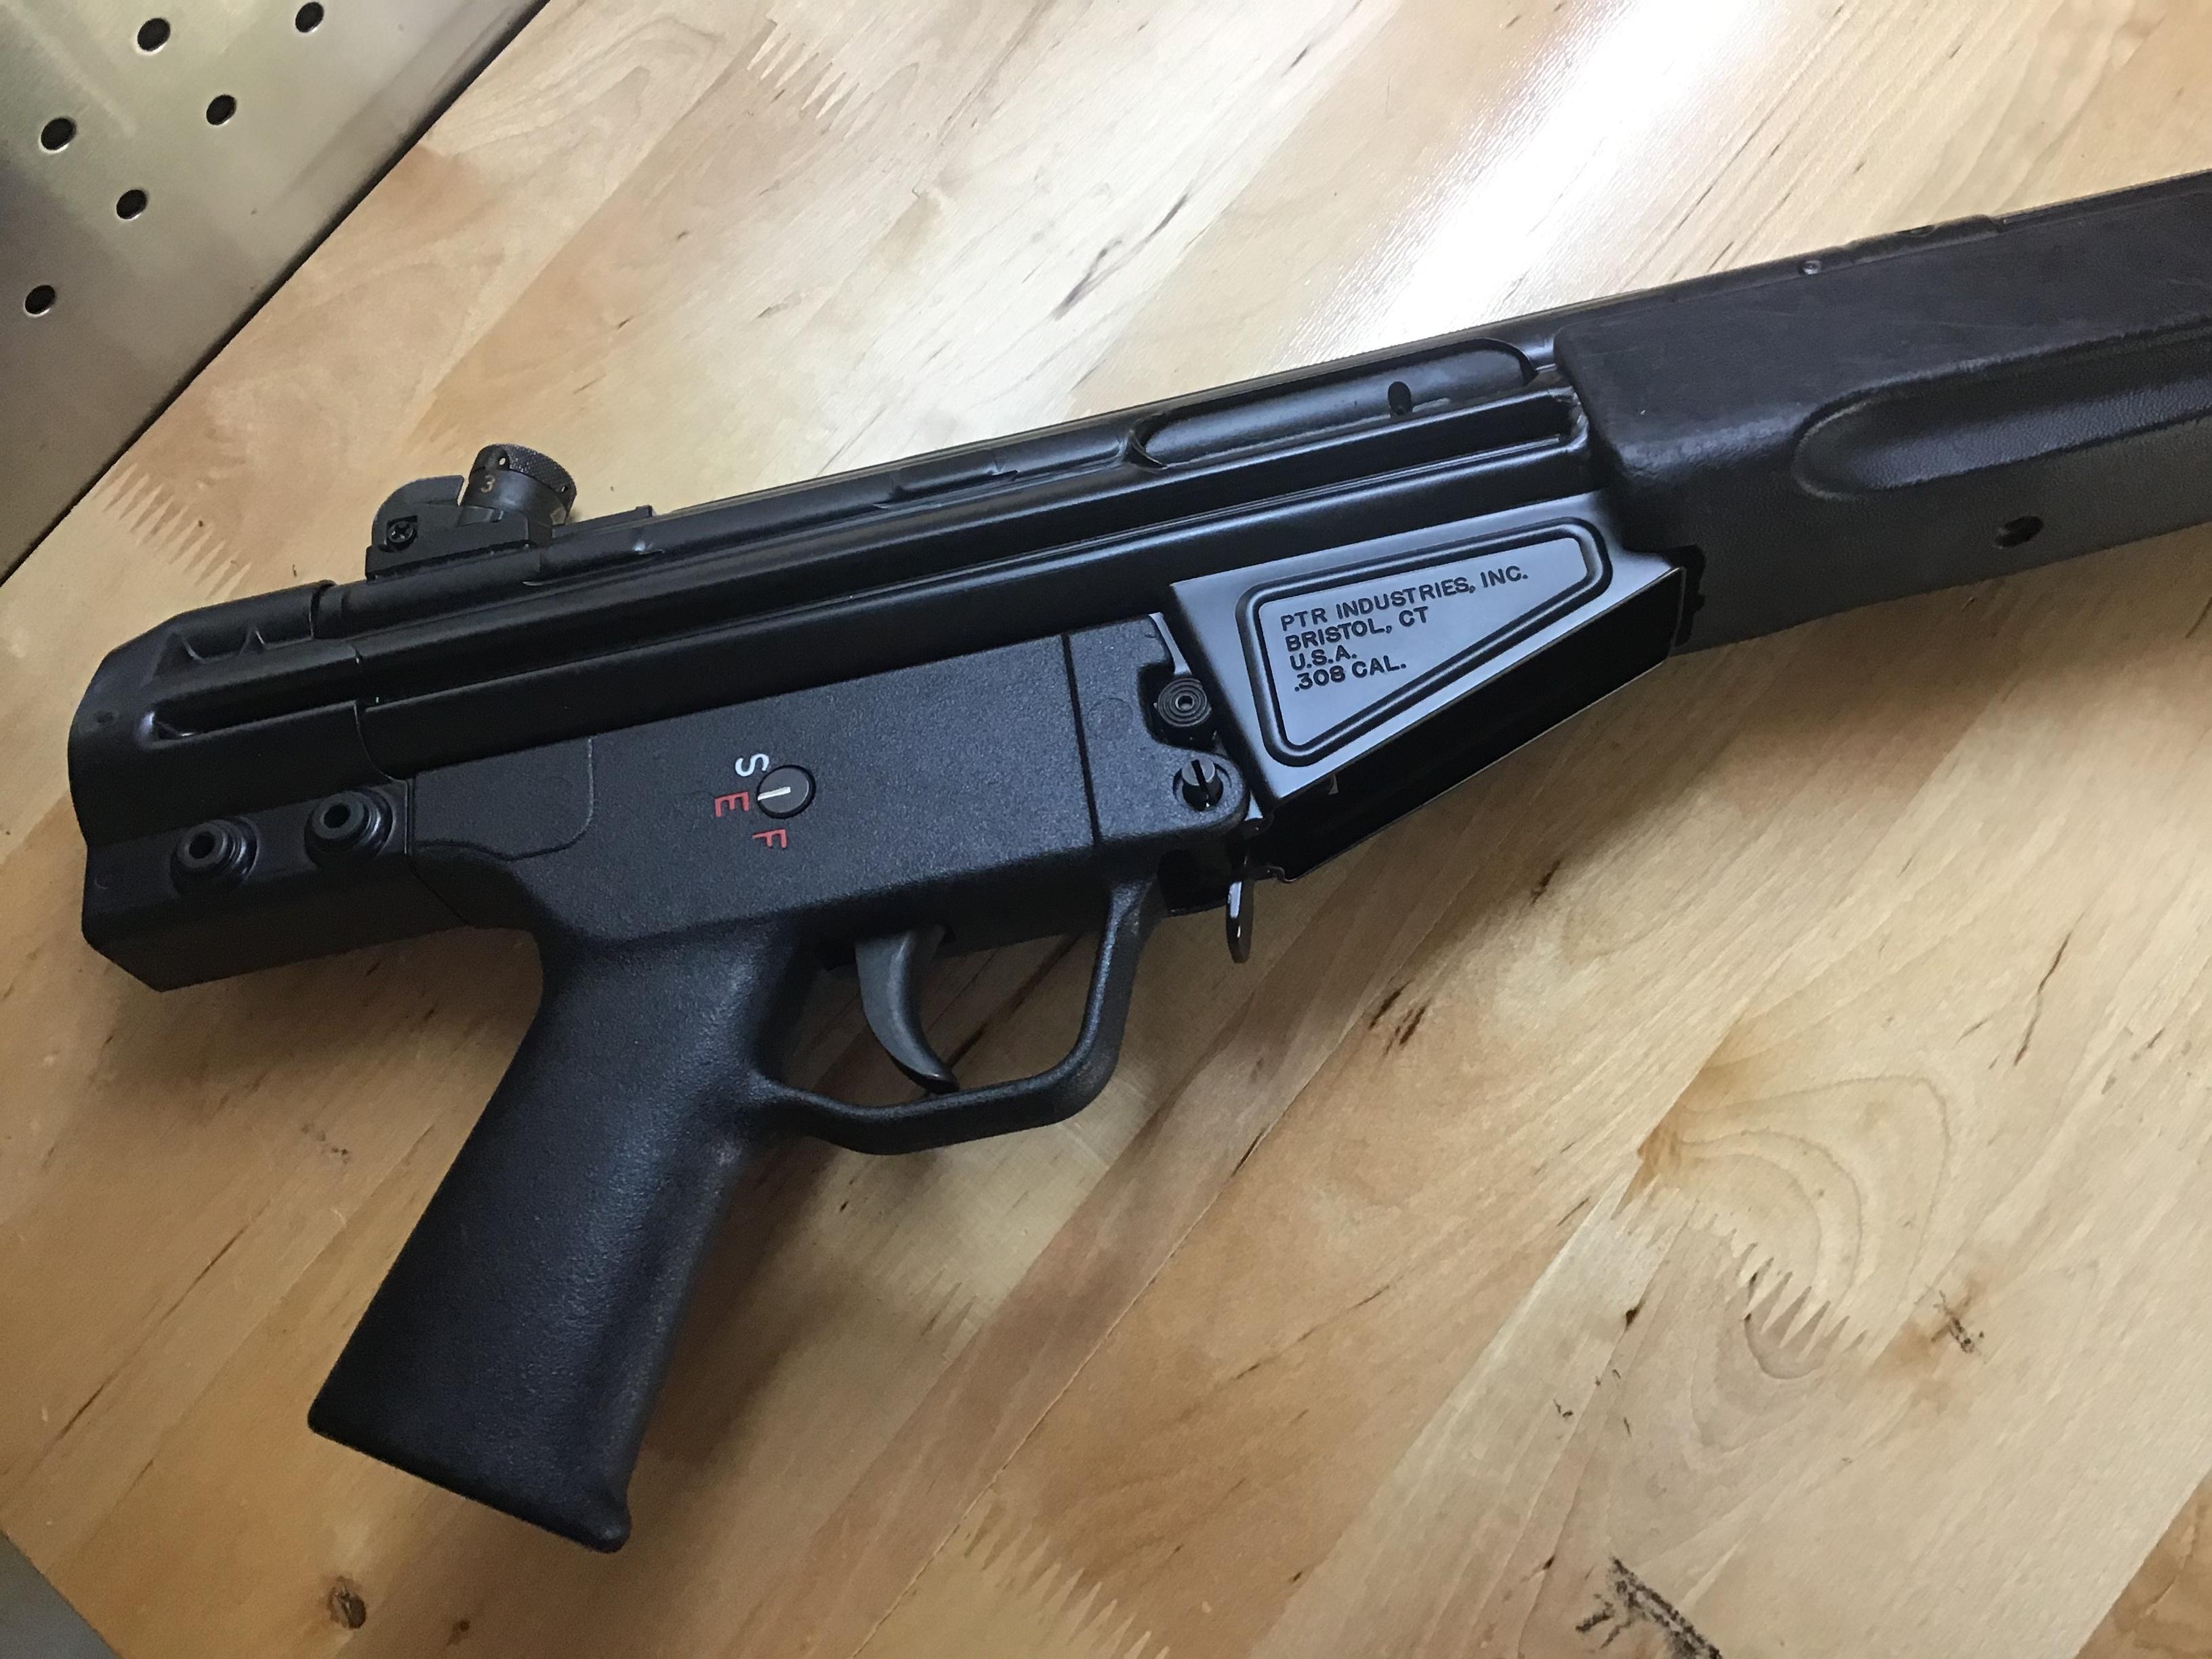 "WTS: G3k ""Pistol"" by PCS-c9b6add1-c63e-4593-81e0-604d295849e6.jpeg"